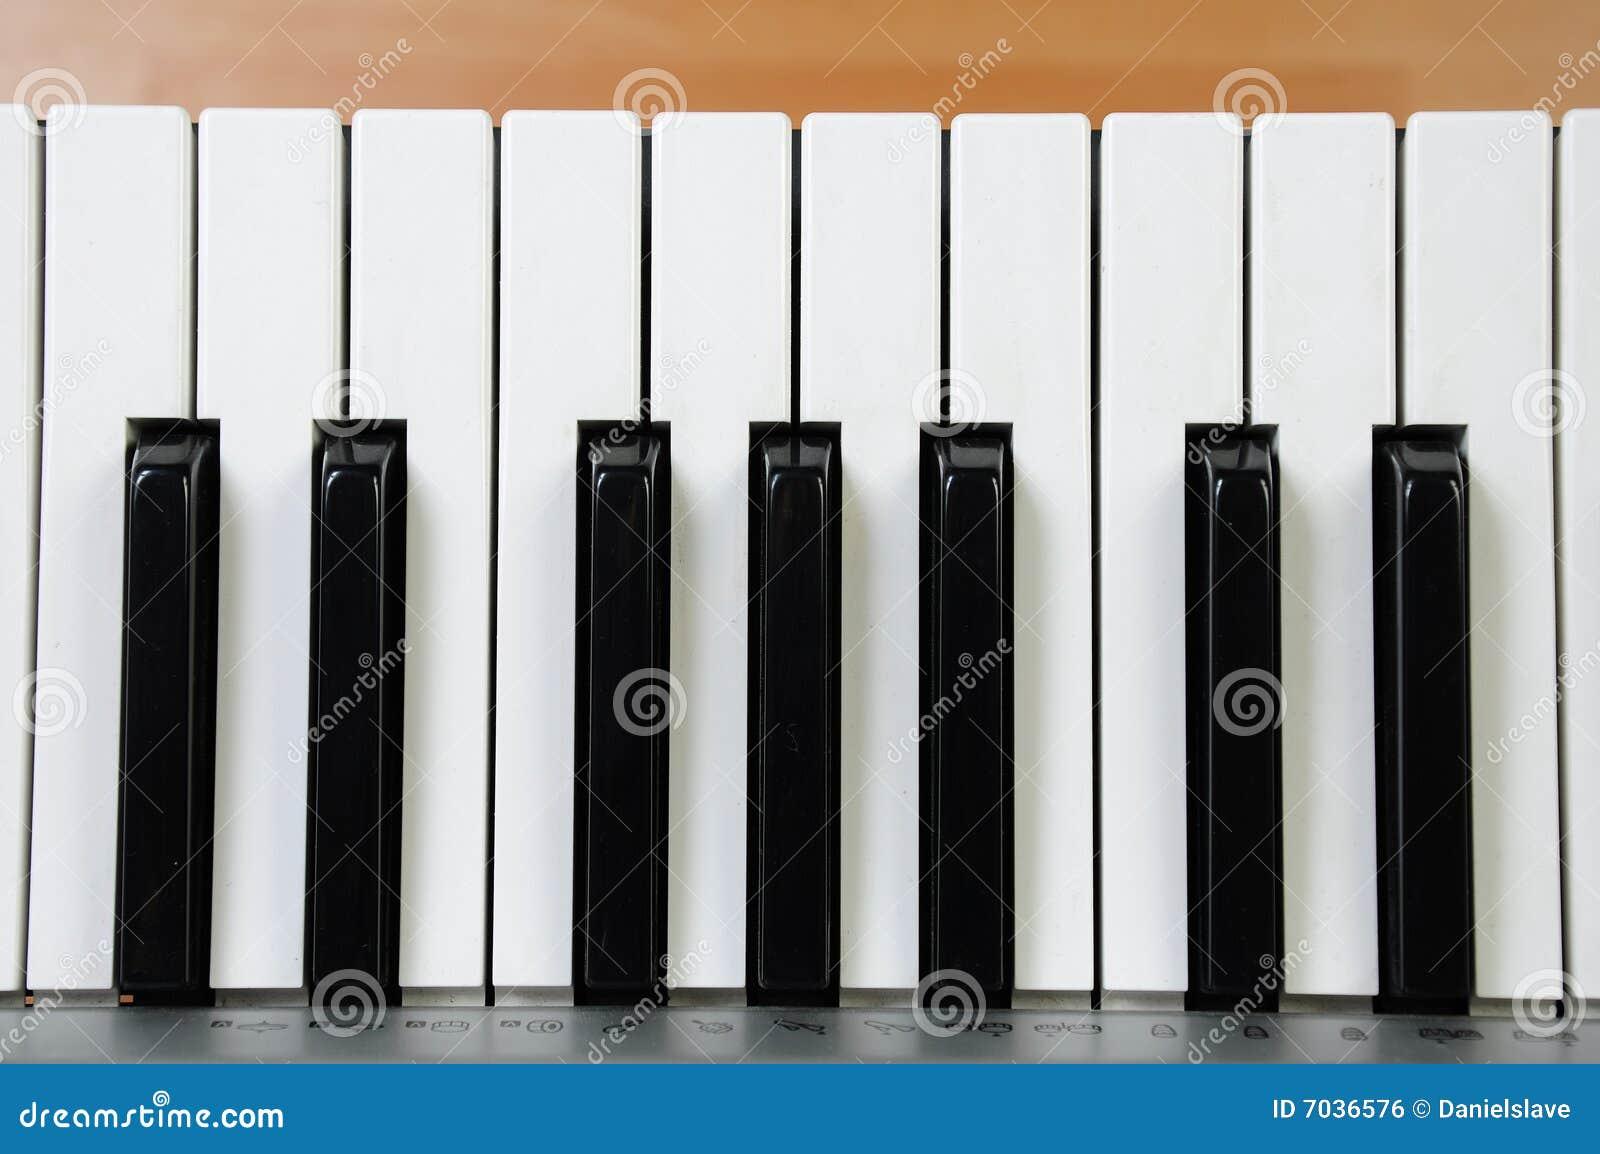 Elkraften keys pianot